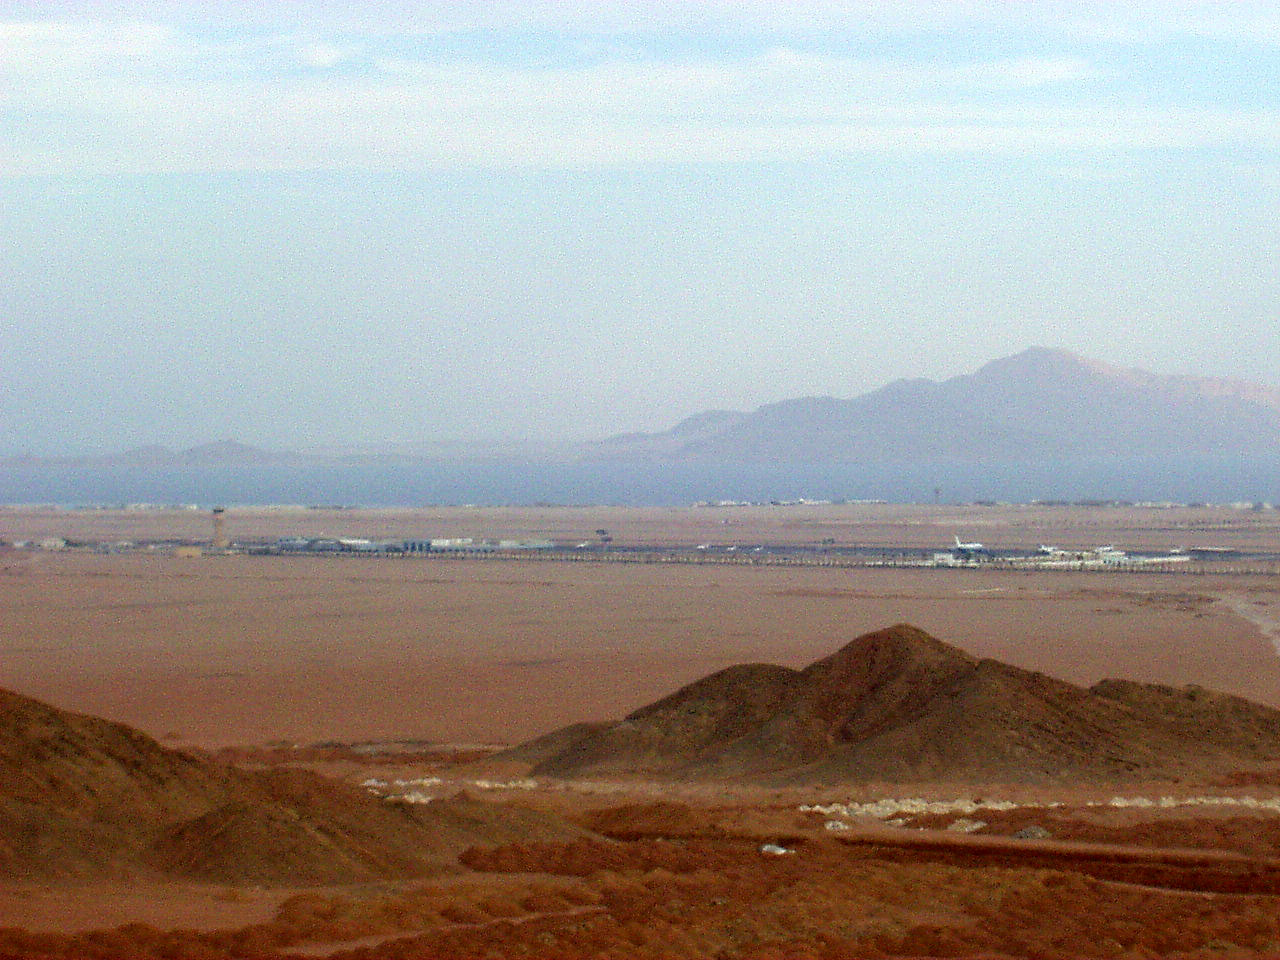 http://4.bp.blogspot.com/-9oFGAwkxifk/TZB2mNAK5dI/AAAAAAAAACY/dZZA9yEuLTw/s1600/Sharm_el-Sheikh_Ophira_International_Airport.jpg